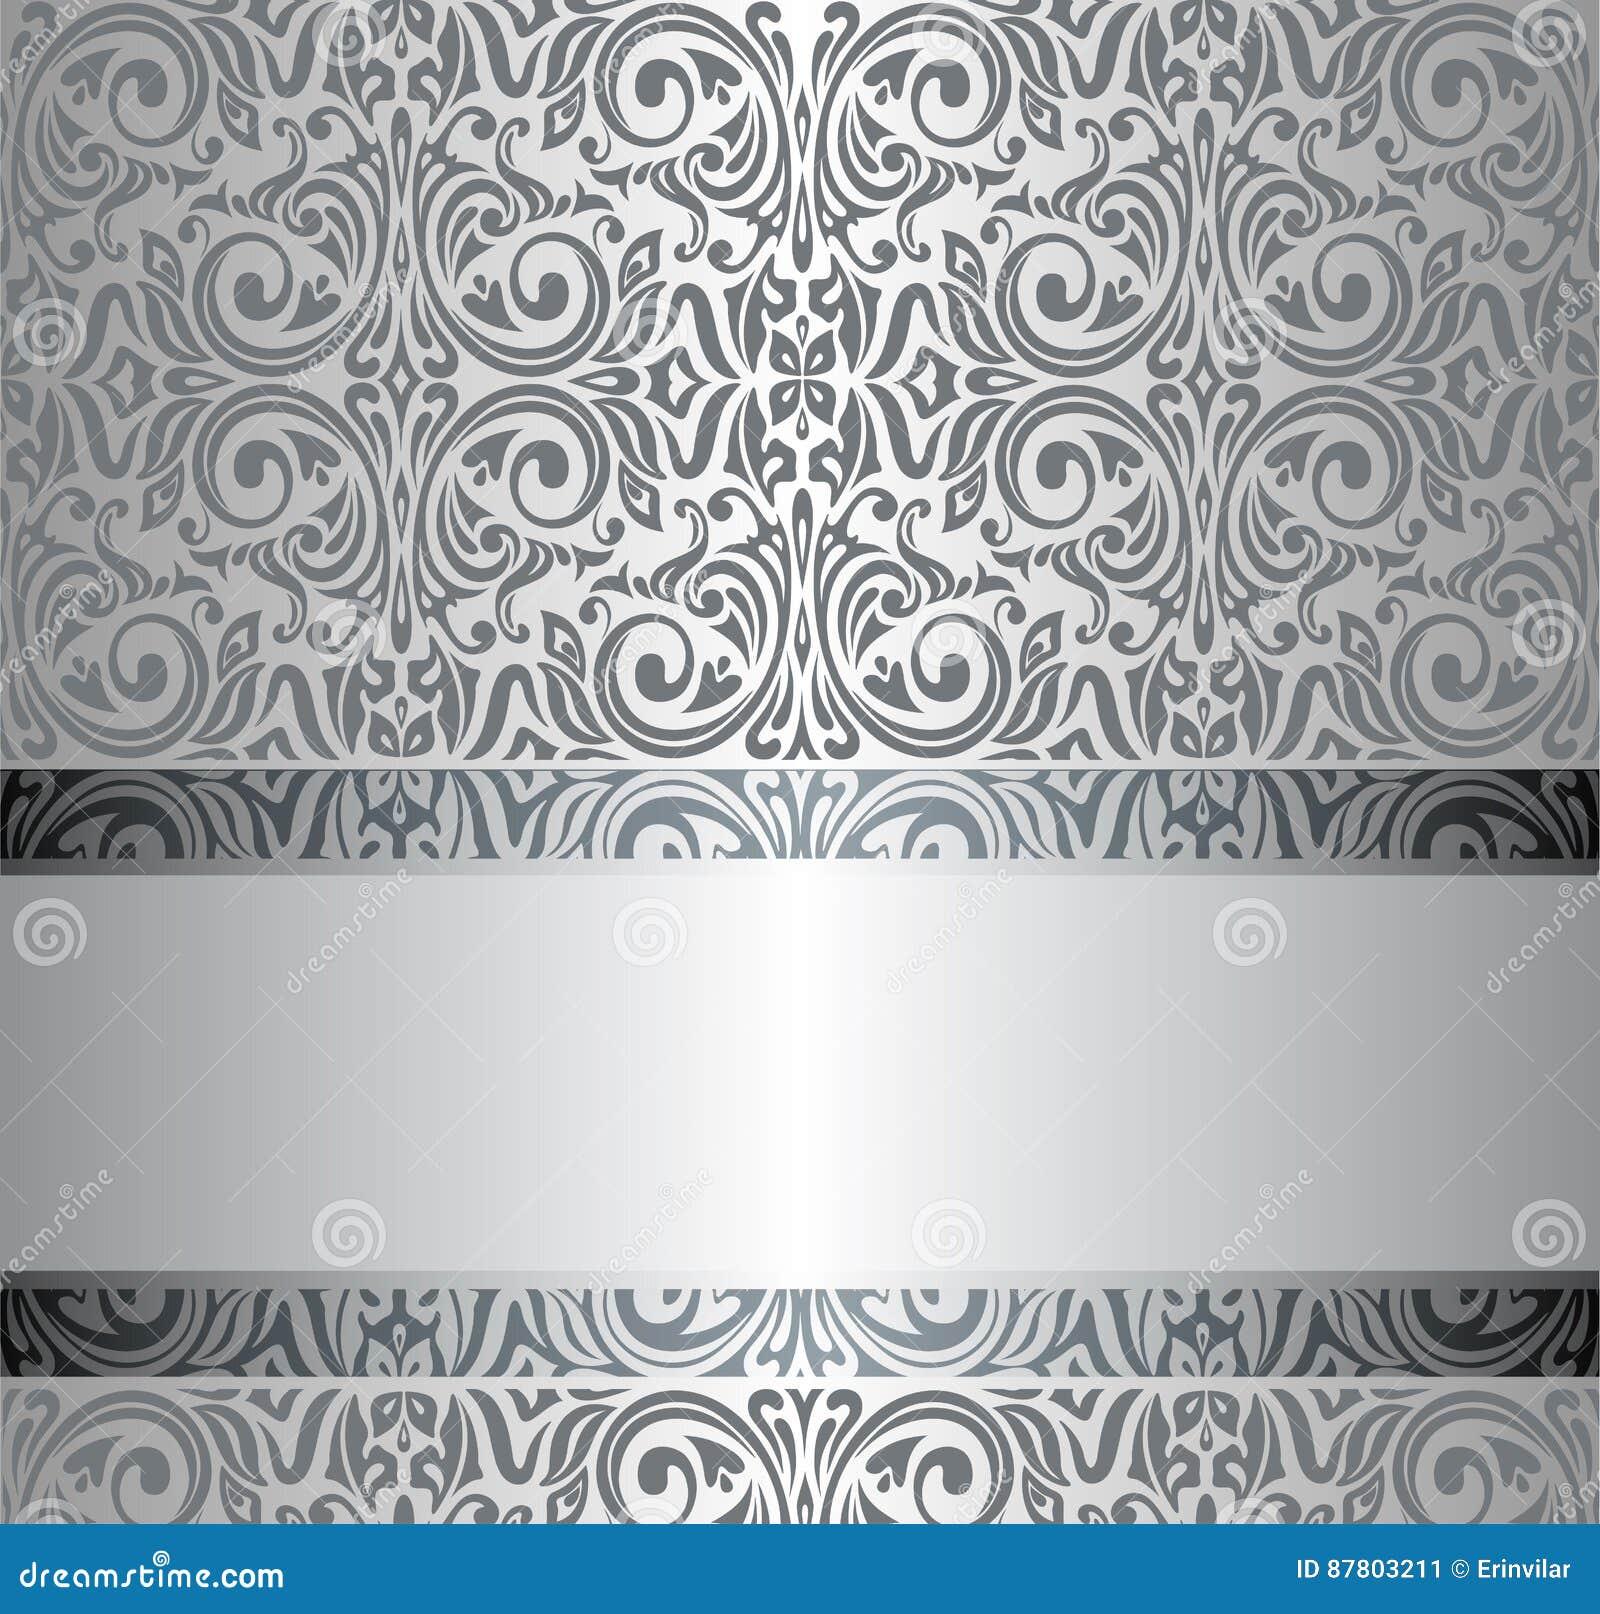 Silver vintage repetitive wallpaper design